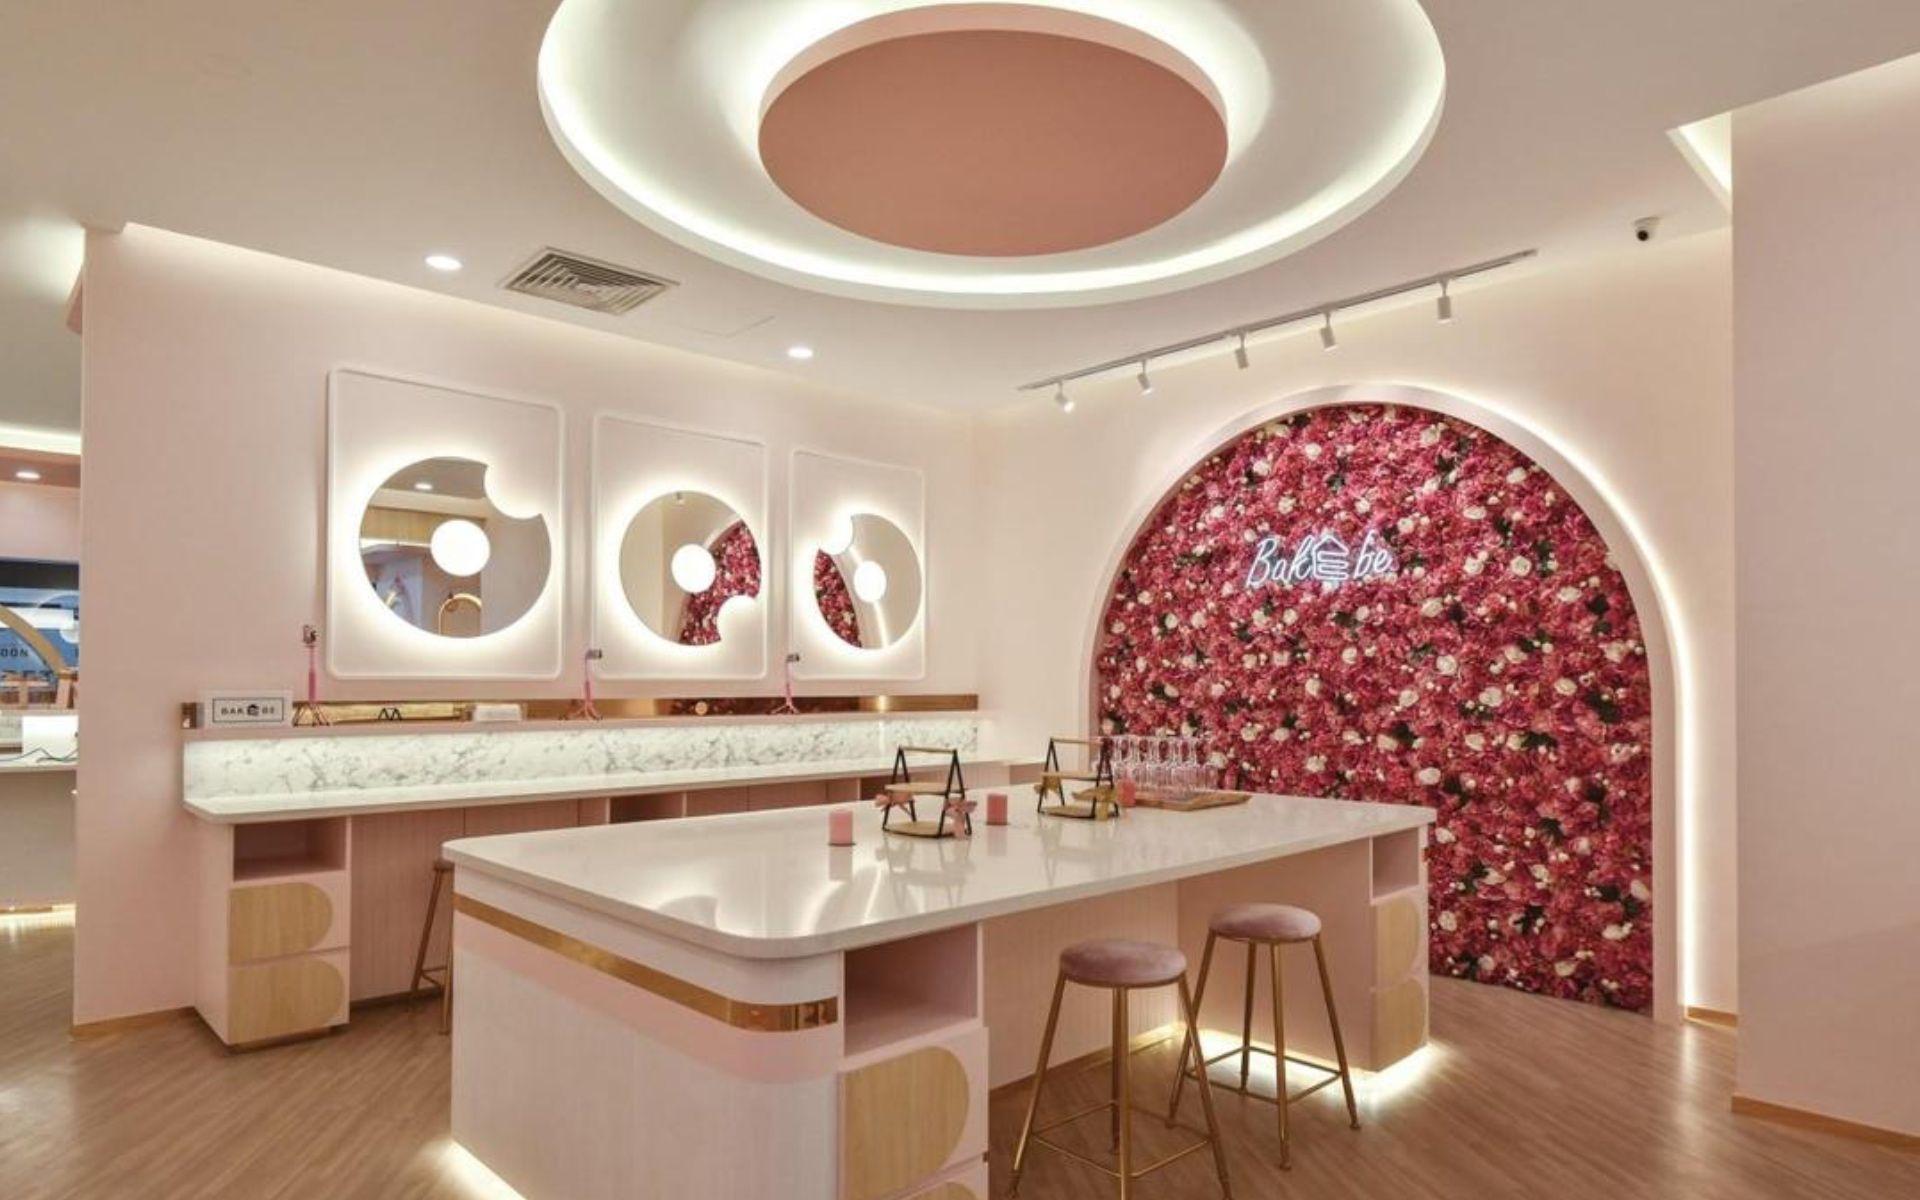 Bakebe, Hong Kong's First App-Based Baking Studio, Opens In Kuala Lumpur